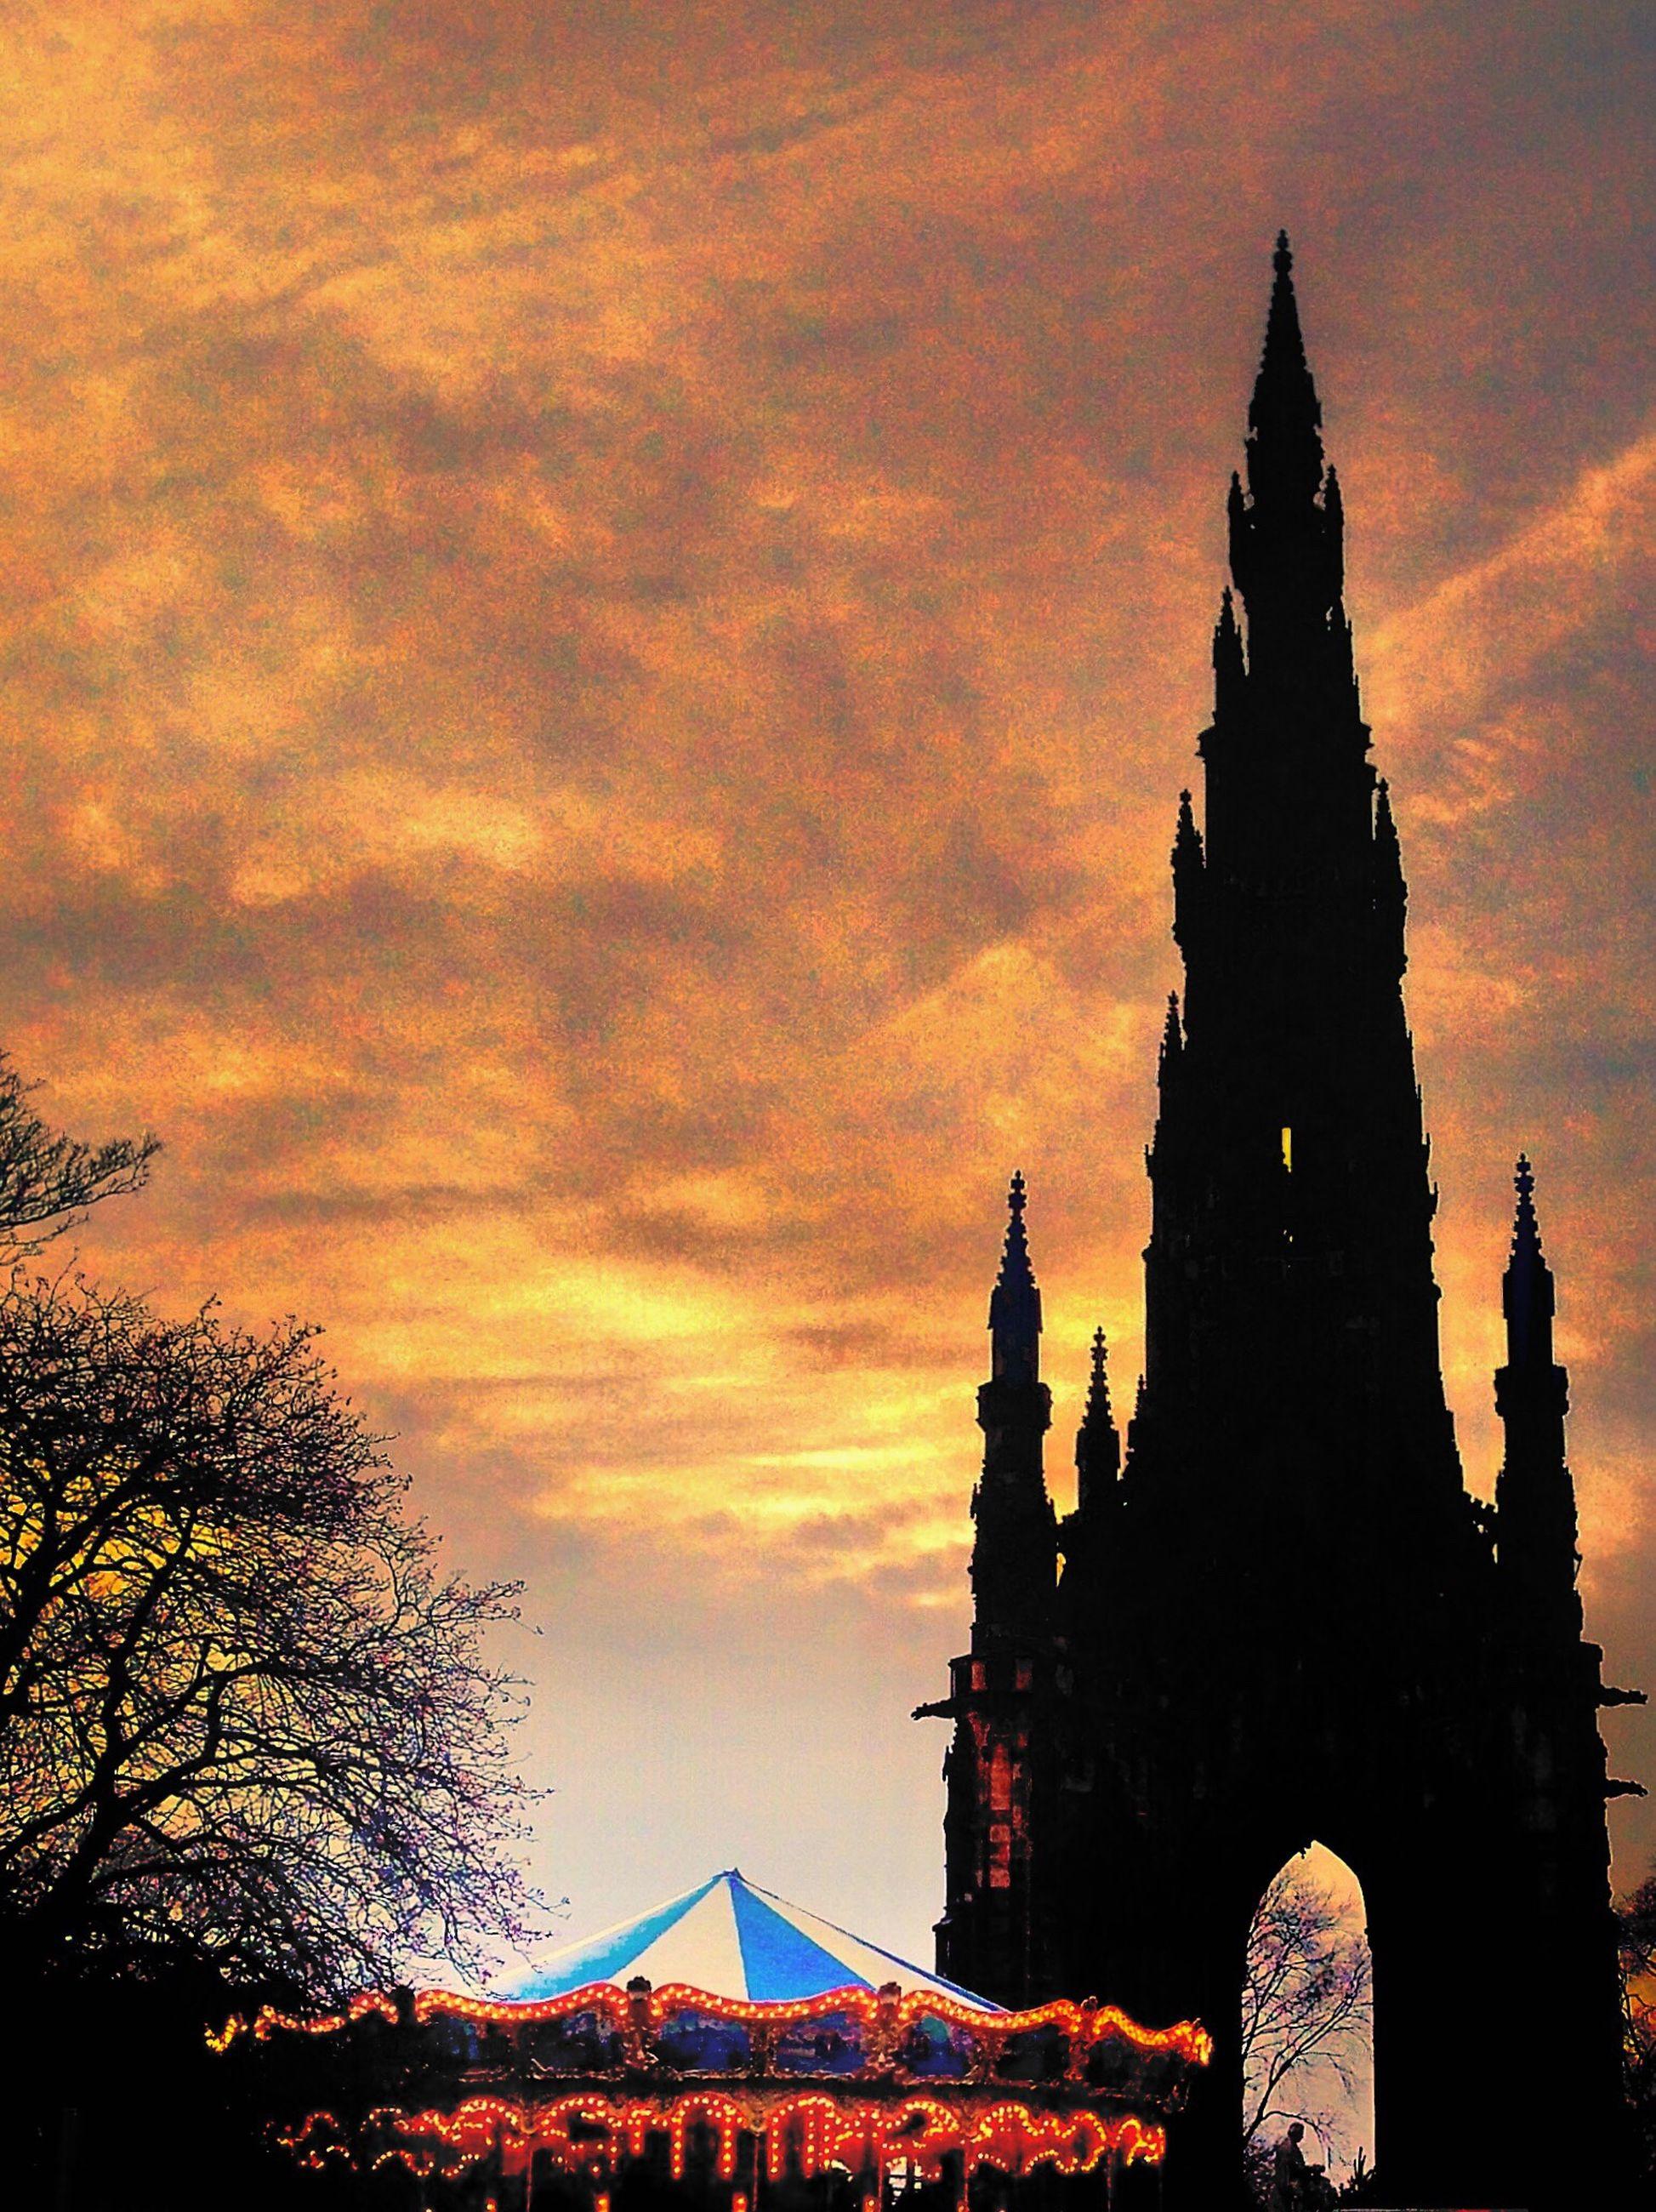 architecture, sunset, building exterior, silhouette, built structure, orange color, no people, sky, travel destinations, place of worship, cloud - sky, city, outdoors